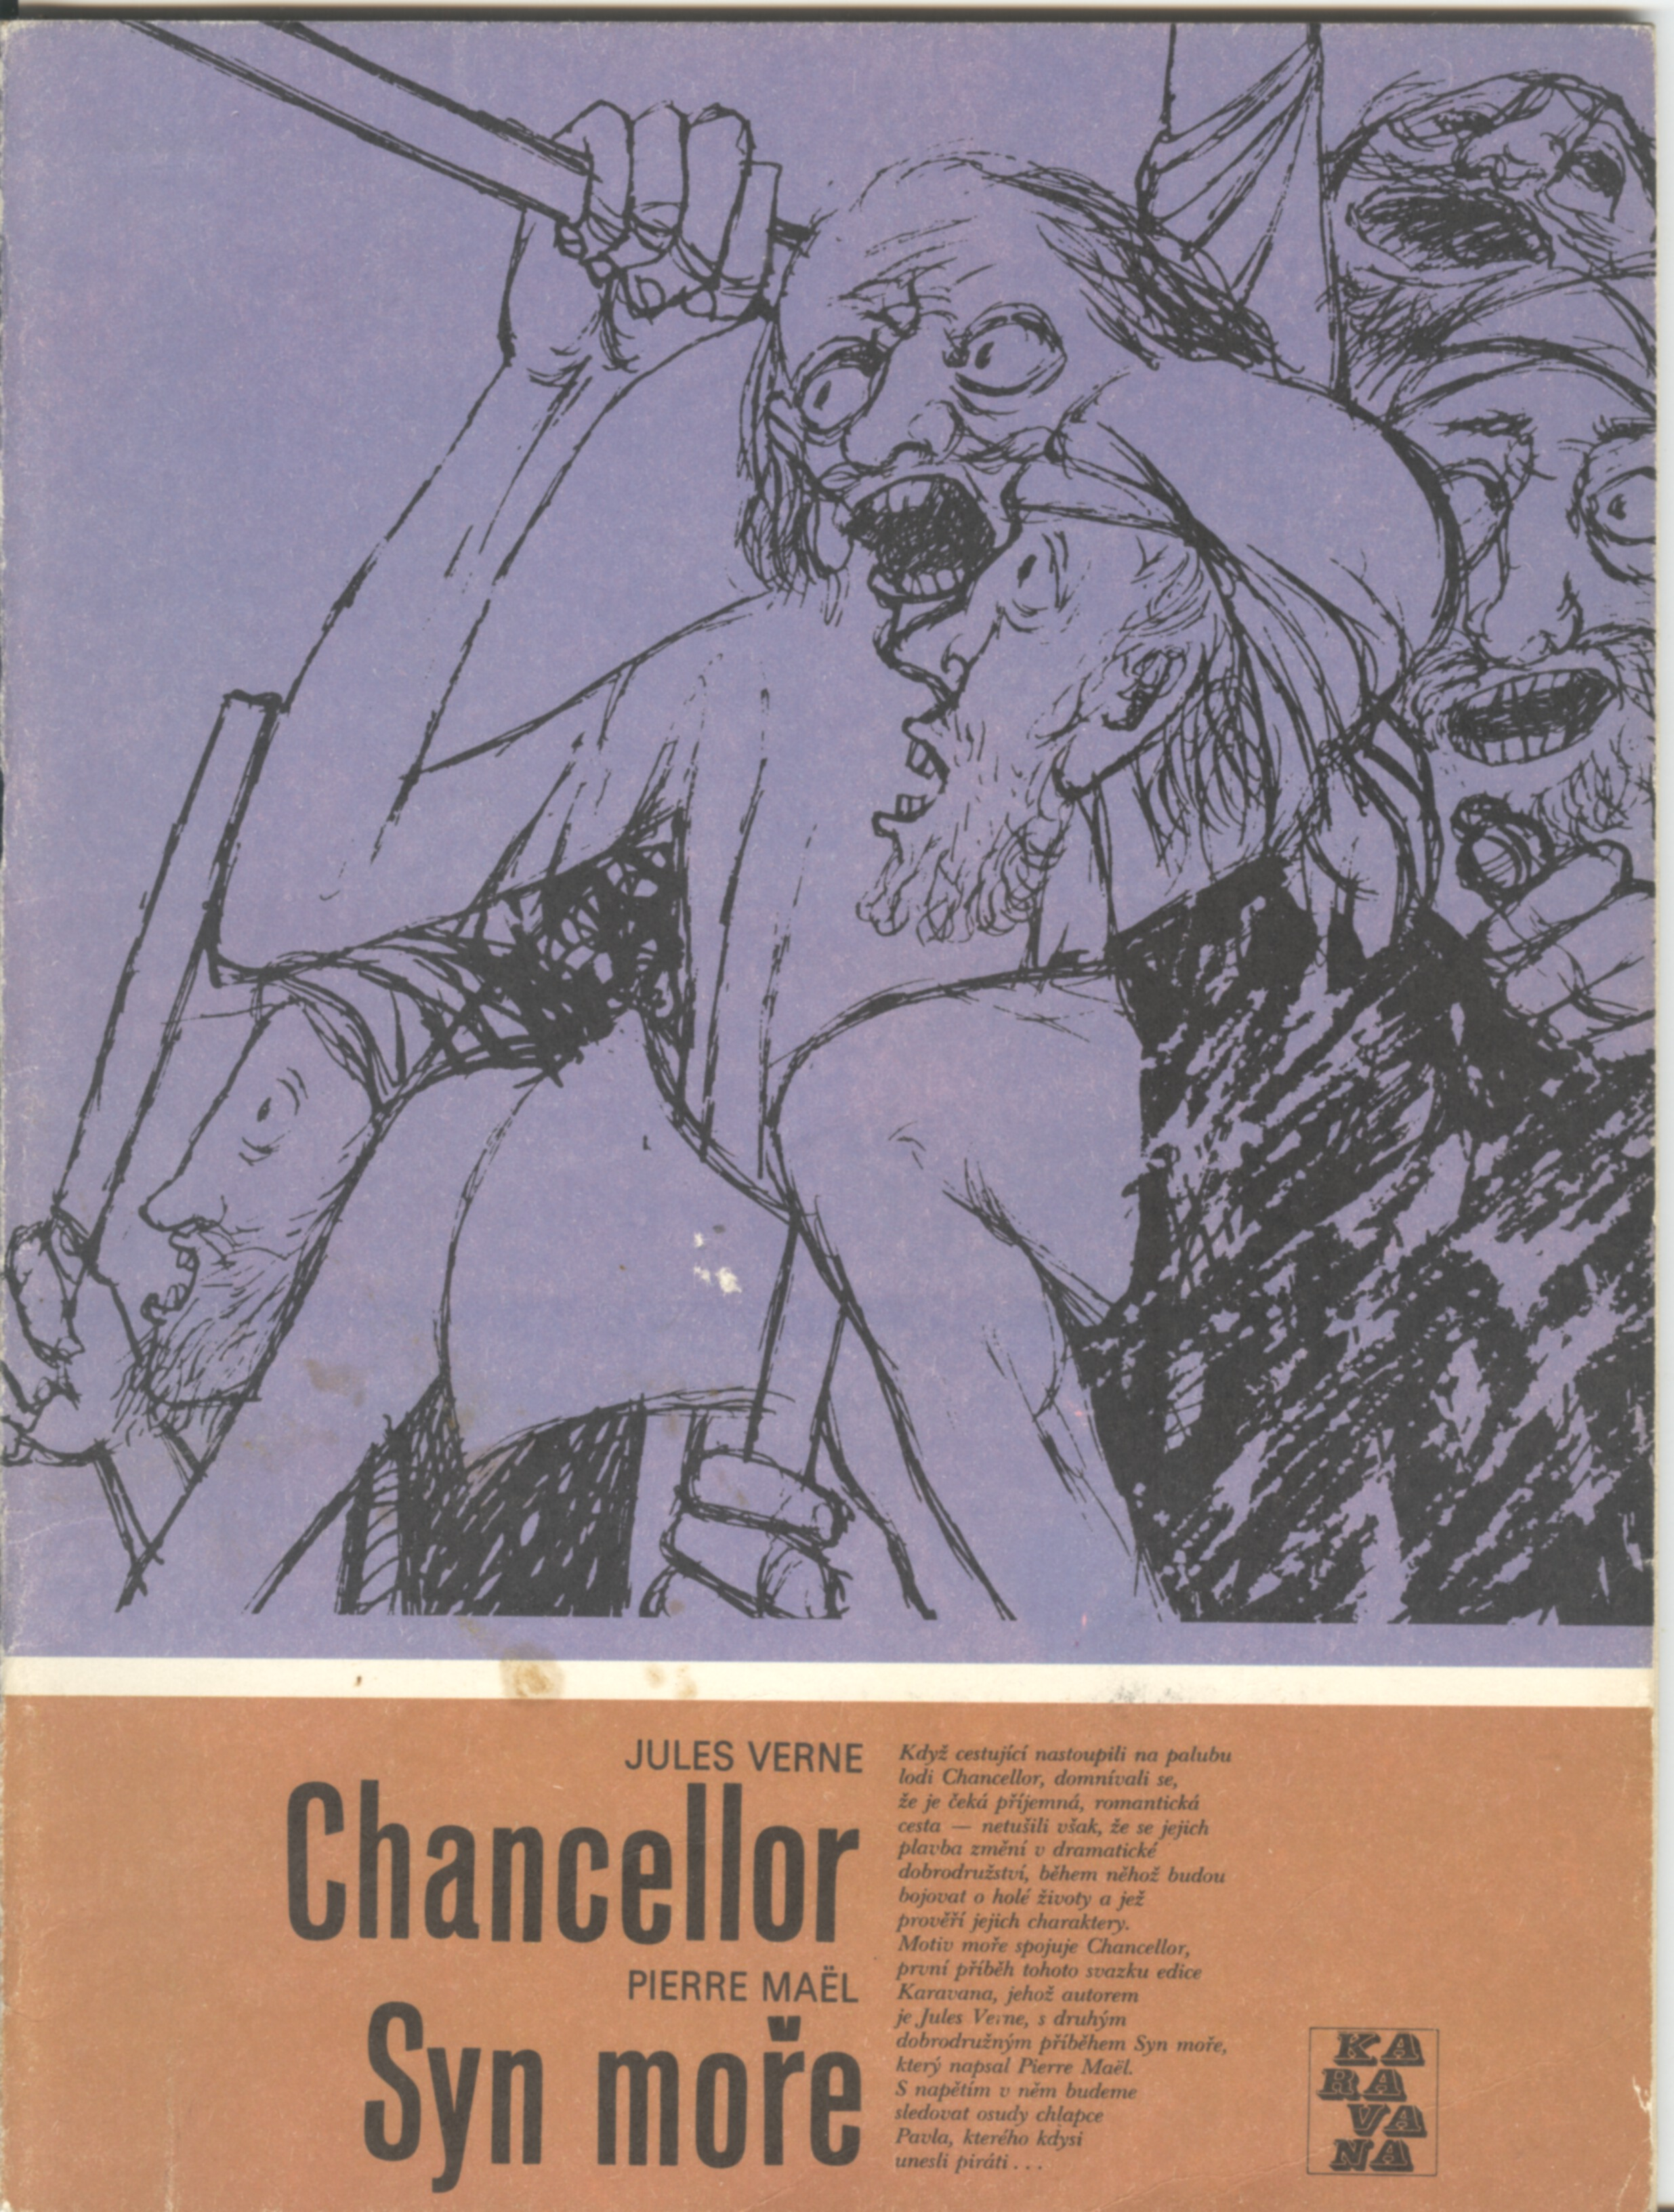 Chancellor - Jules Verne, Syn moře - Pierre Mael (Karavana)